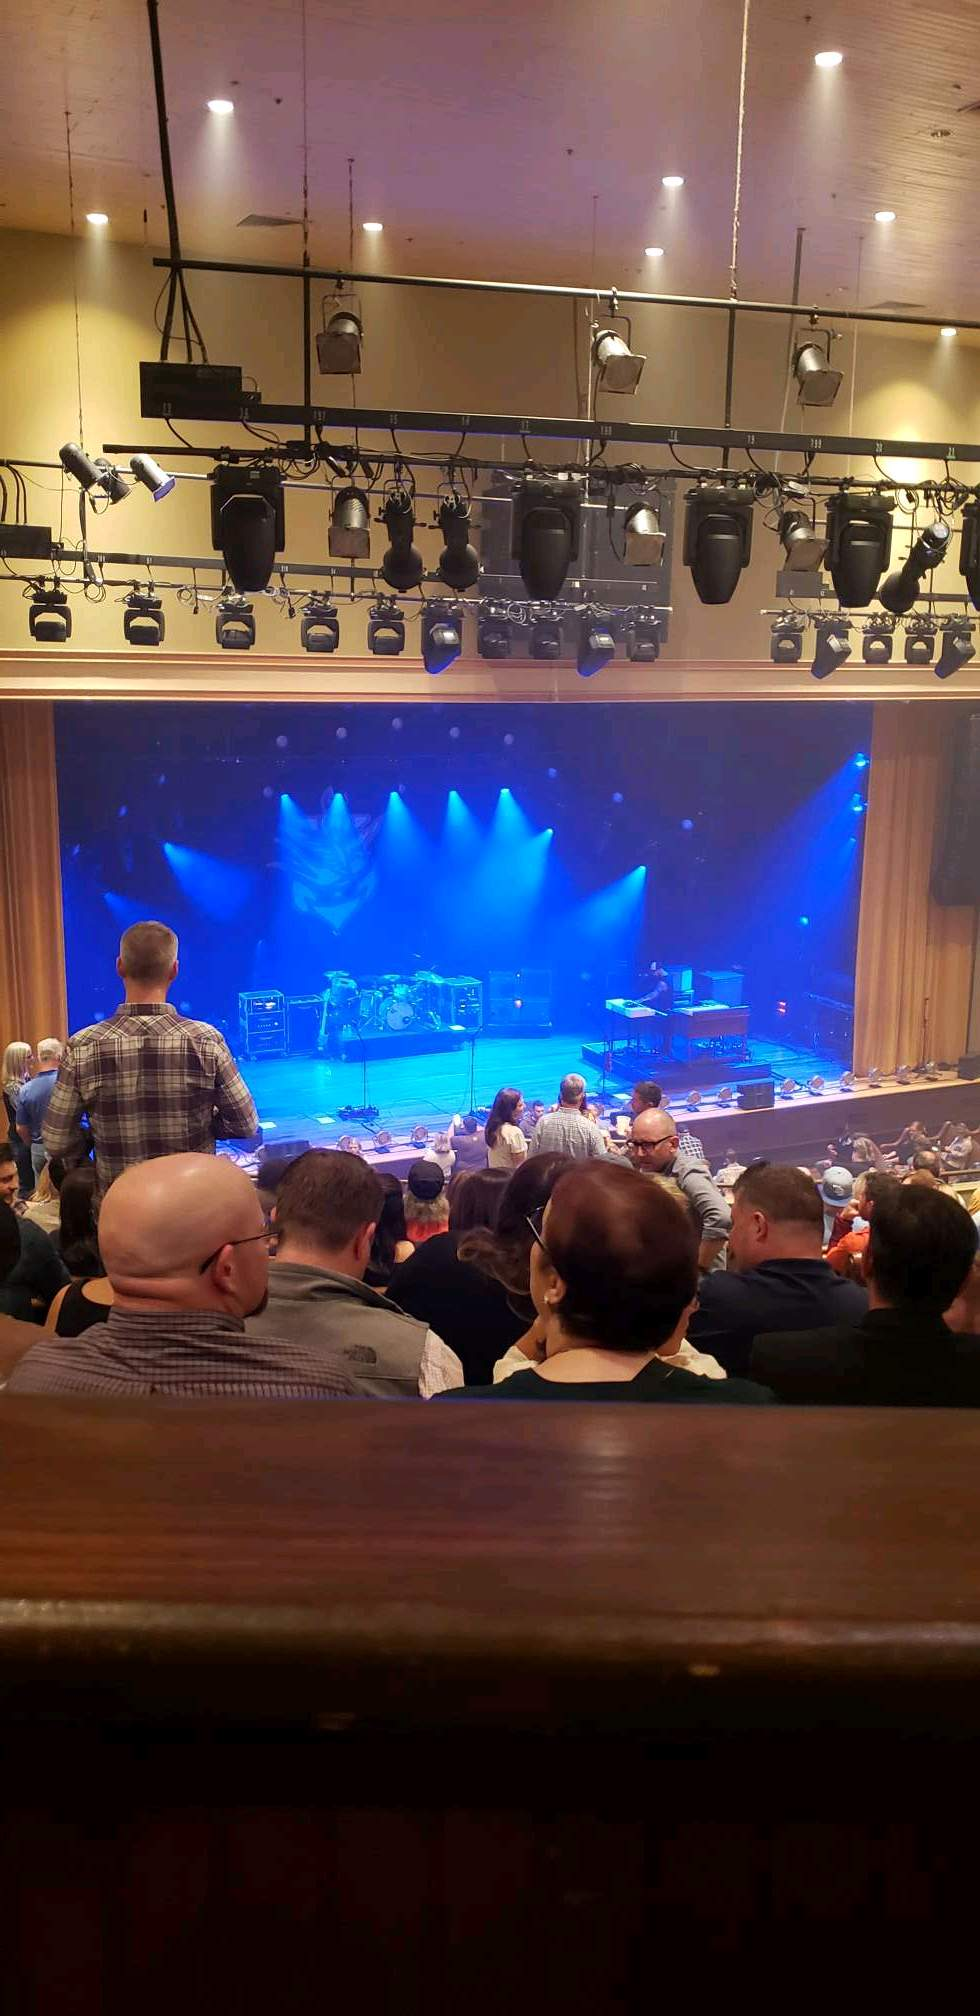 Ryman Auditorium Section Bal-14 Row P Seat 2